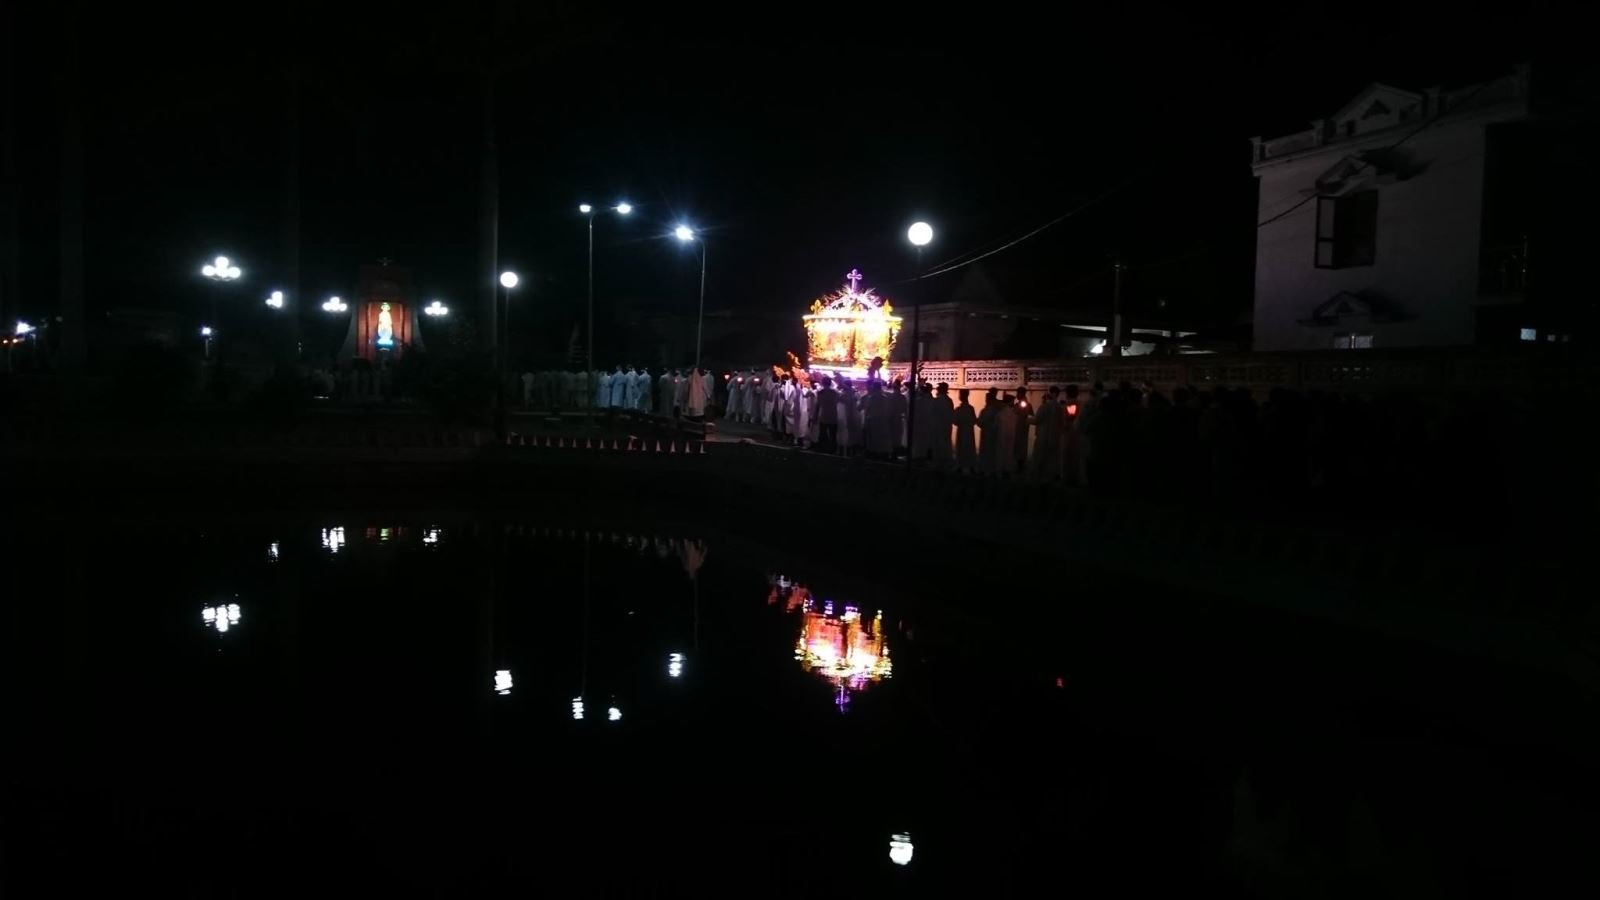 Gx Hong Quang